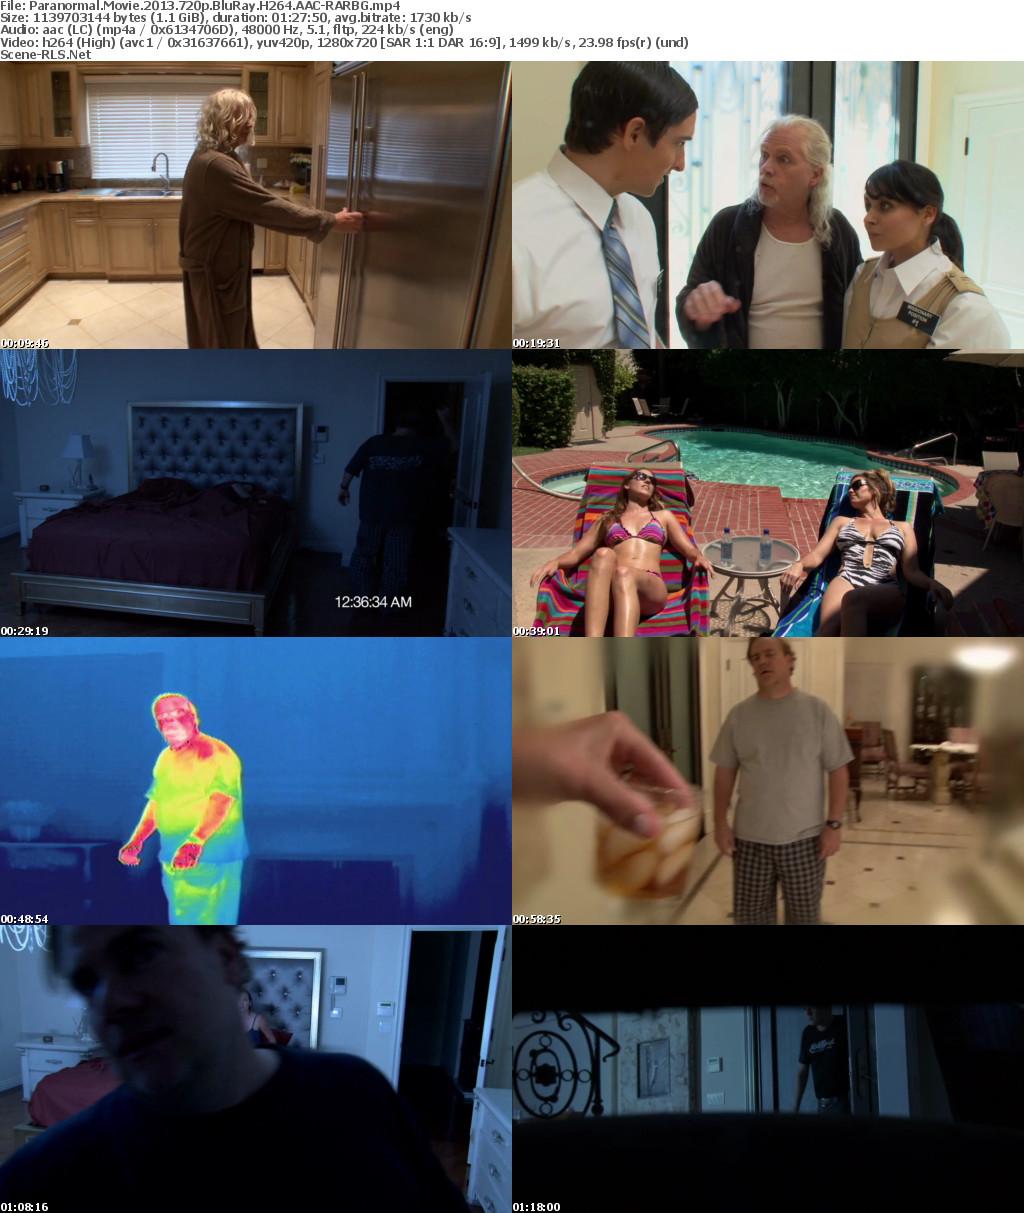 Paranormal Movie 2013 720p BluRay H264 AAC-RARBG - Scene Release